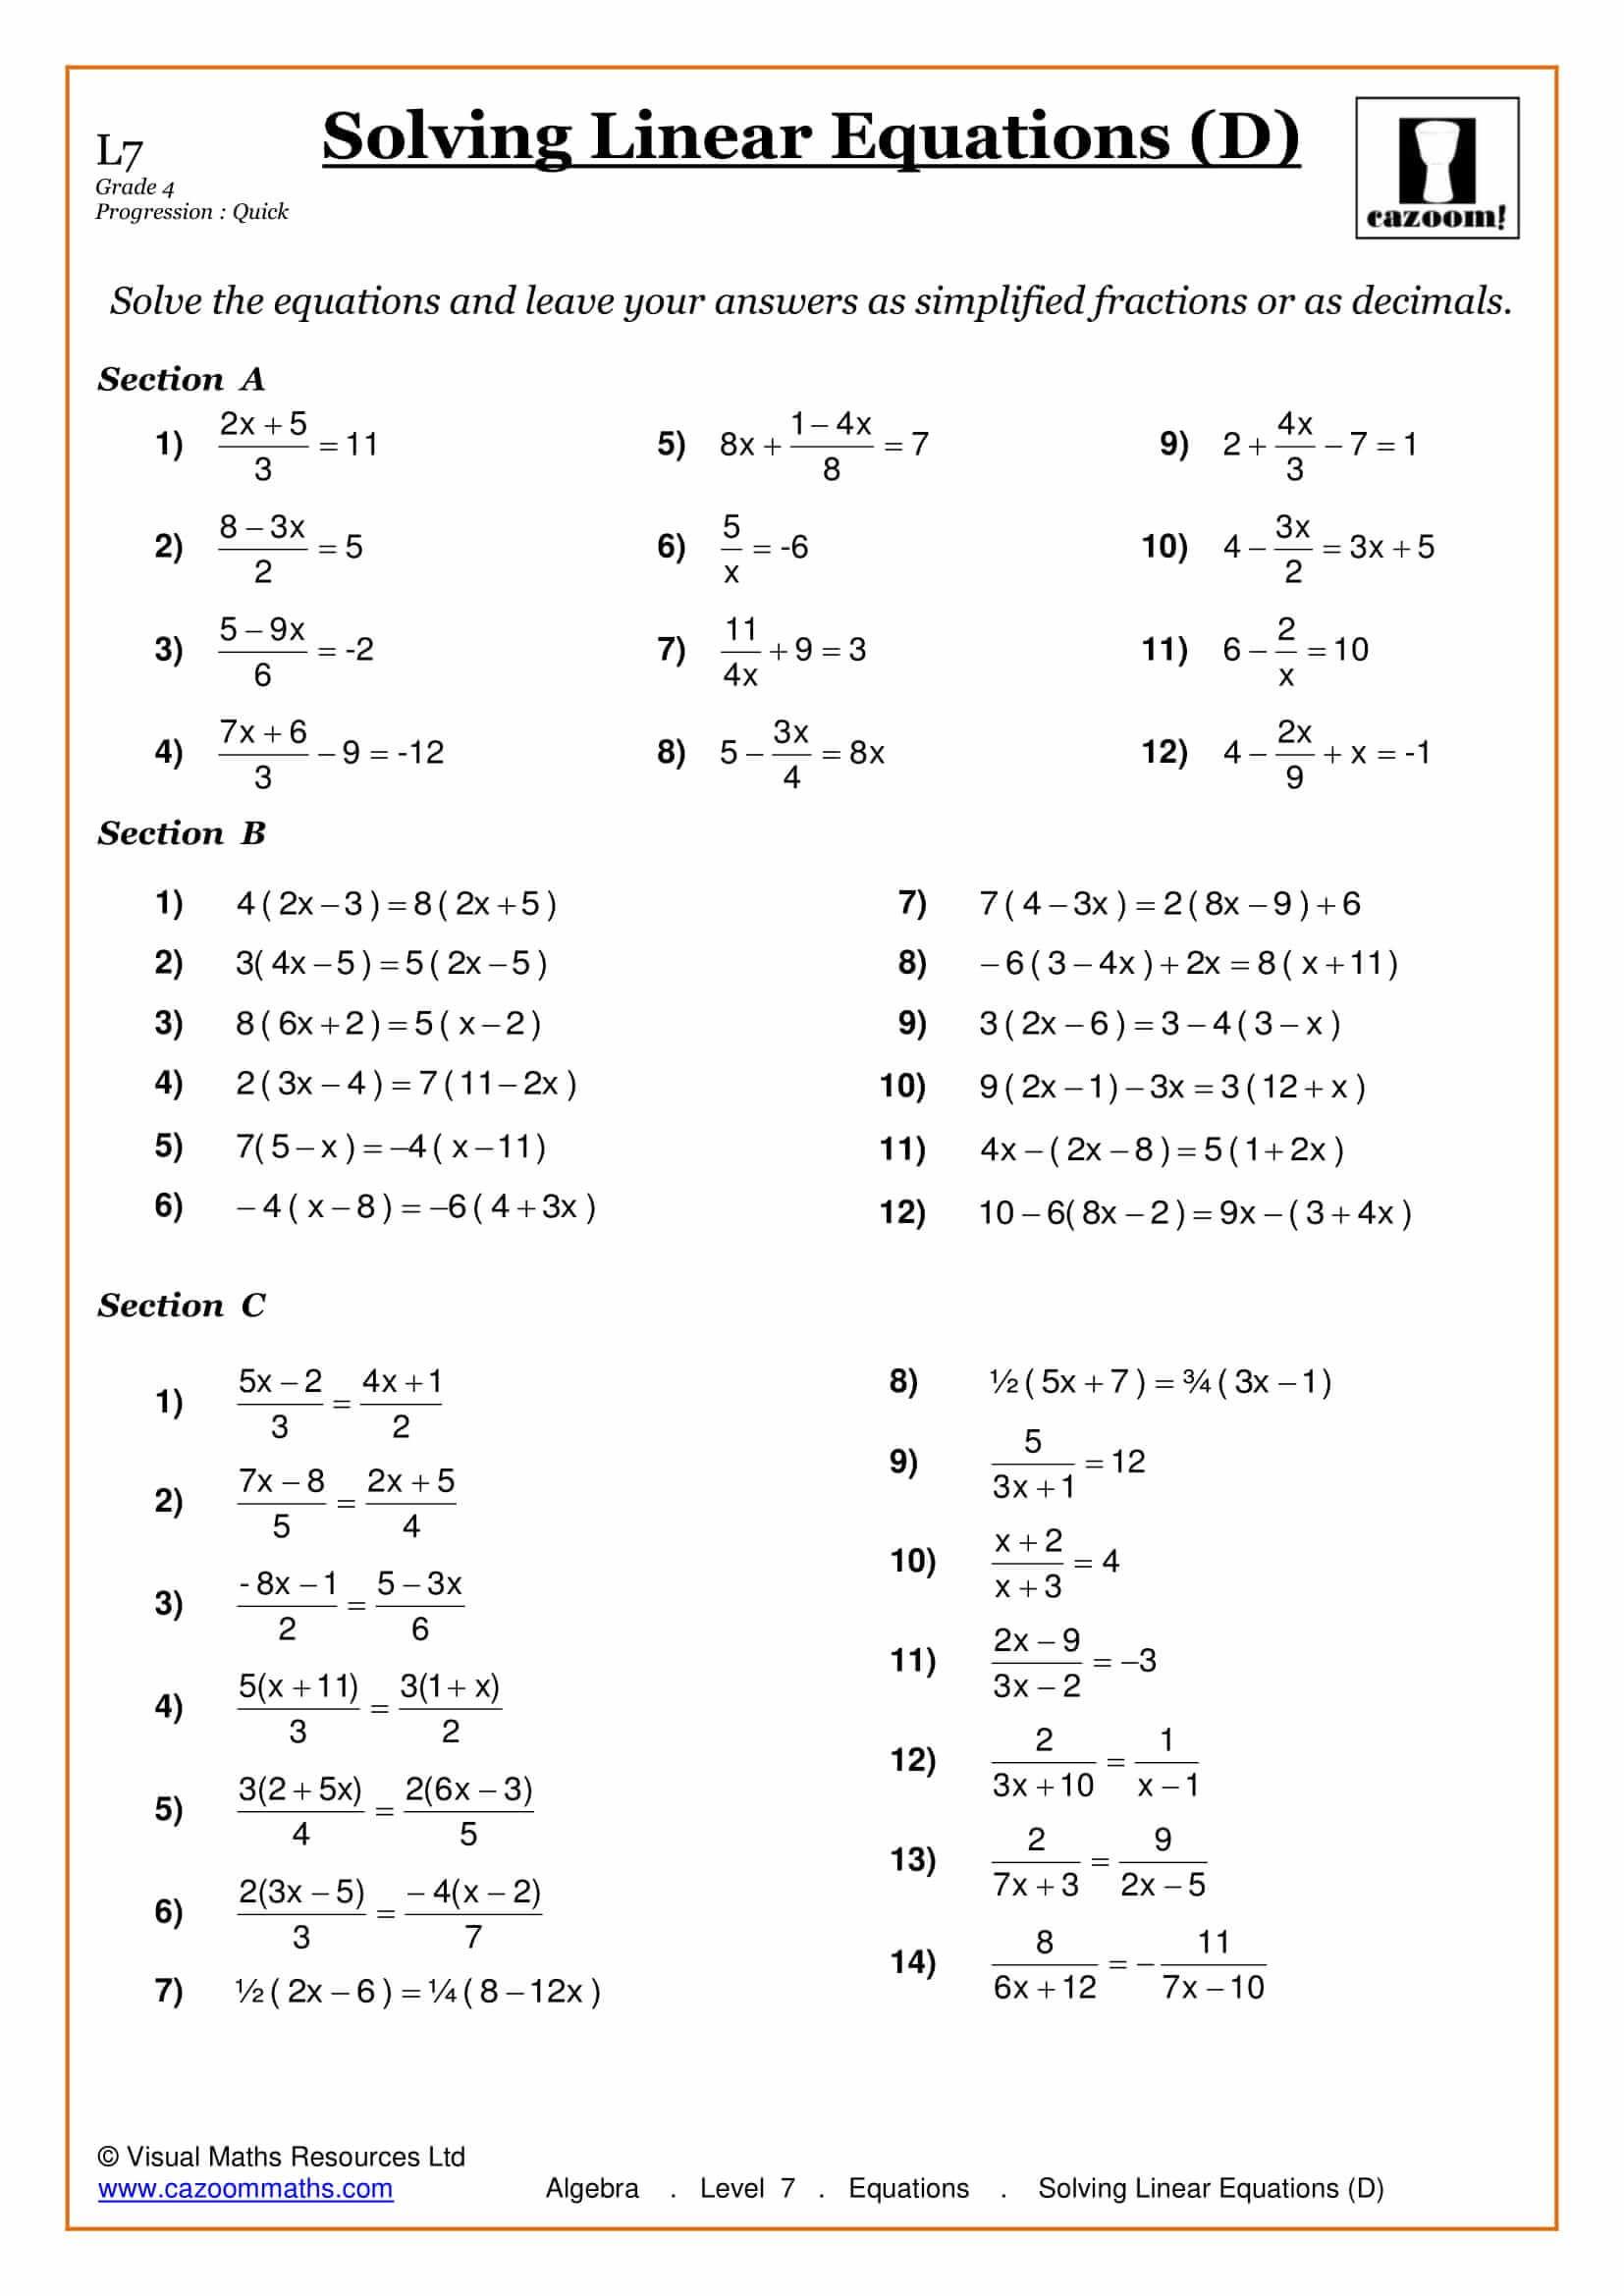 small resolution of Solving Equations Maths Worksheet - cazoommaths.com   Algebra worksheets